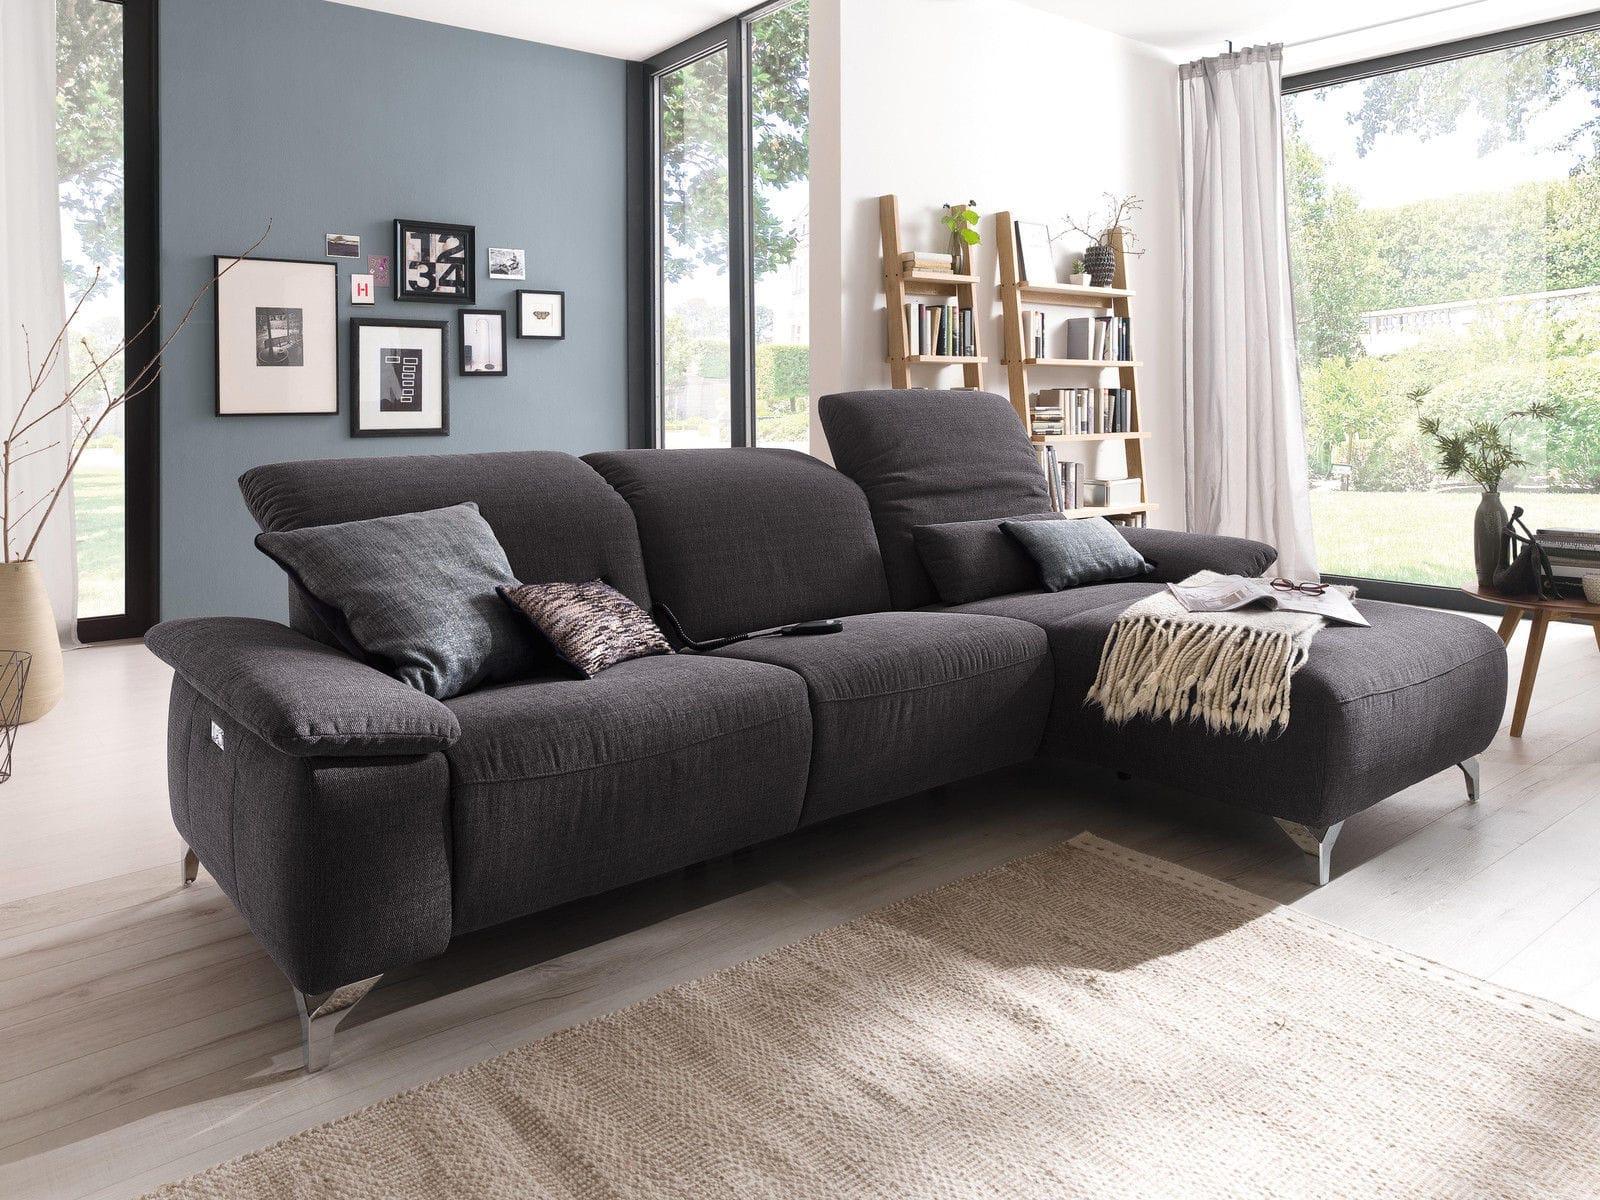 Modular Sofa Mr 370 Musterring Contemporary Fabric